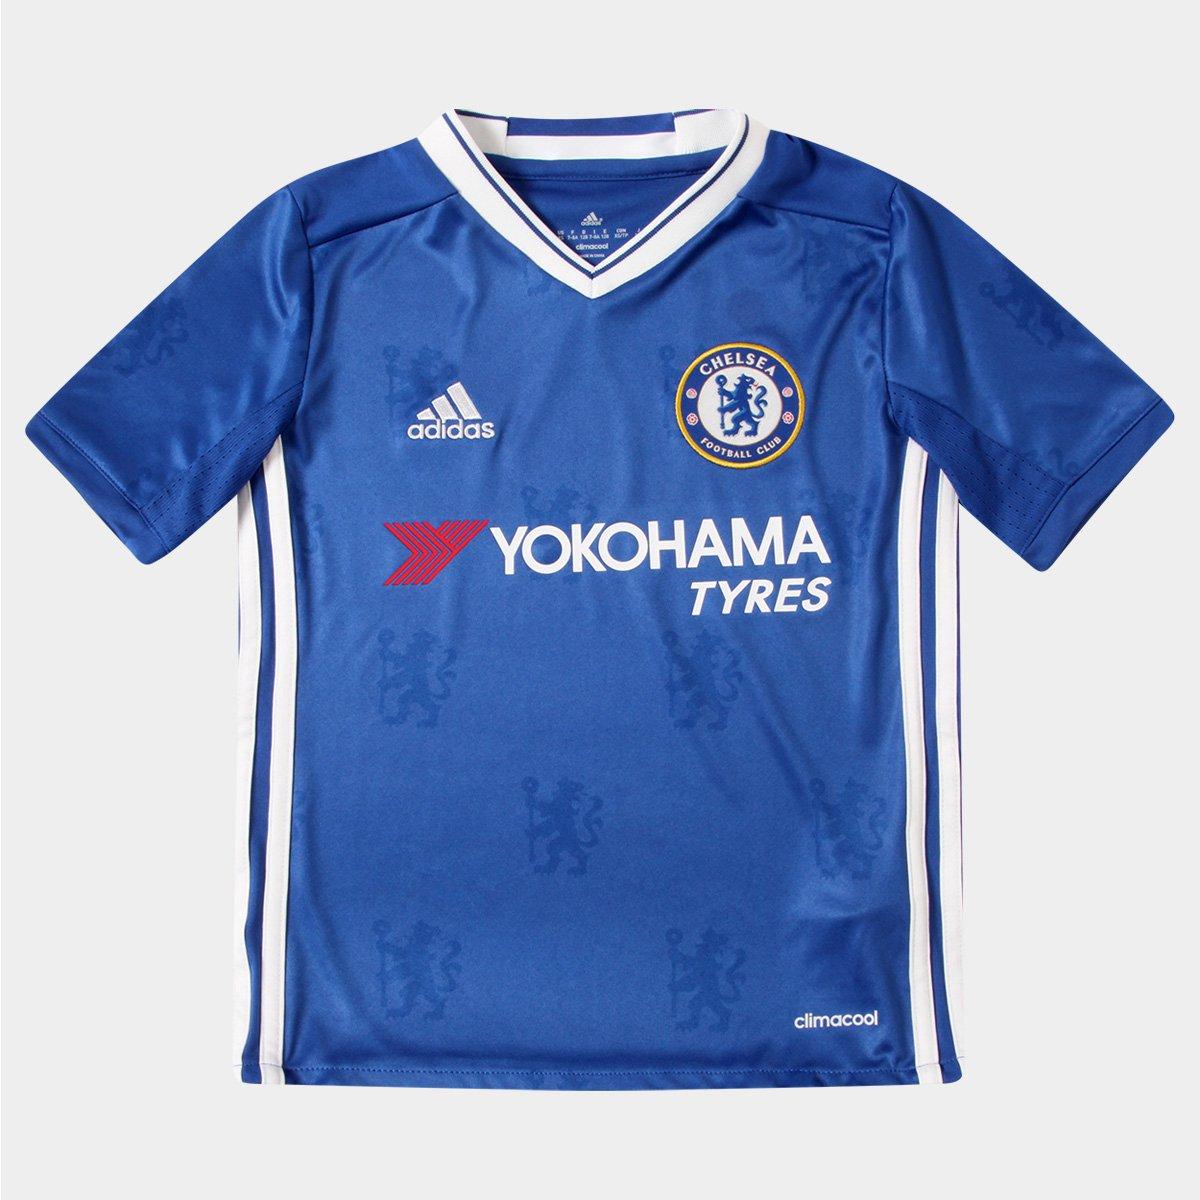 7363369453 Camisa Chelsea Infantil Home 16 17 s nº Torcedor Adidas - Compre Agora